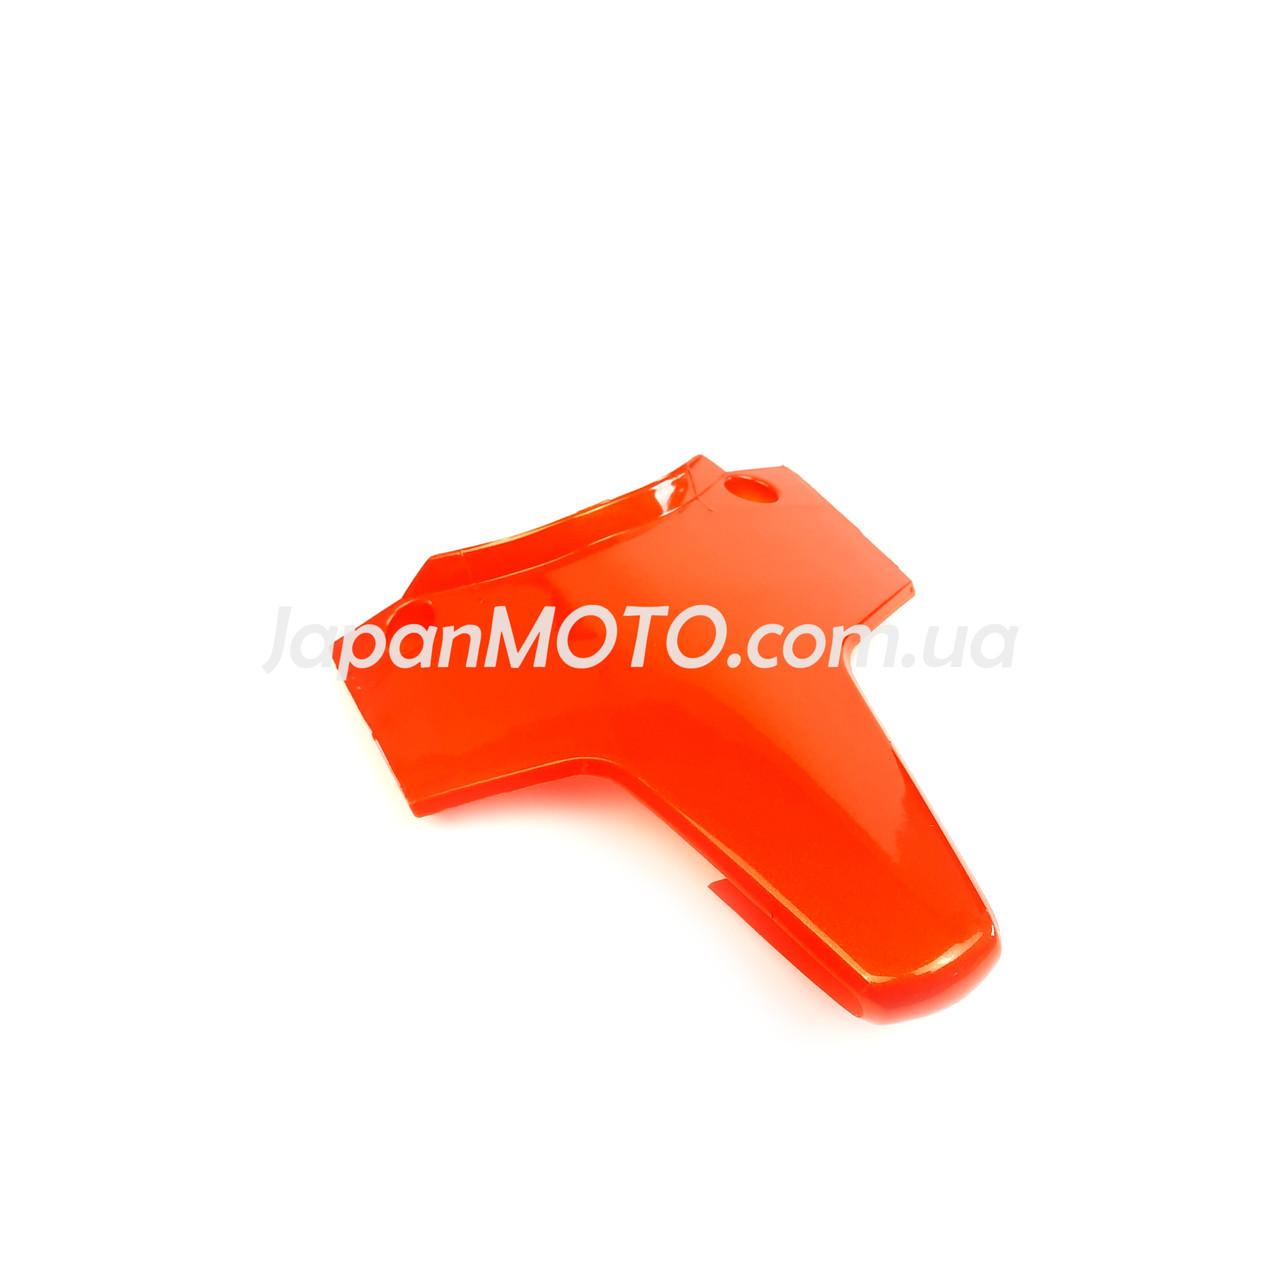 Крышка задняя, пластик на мотоцикл Spark SP200R-27, оригинал